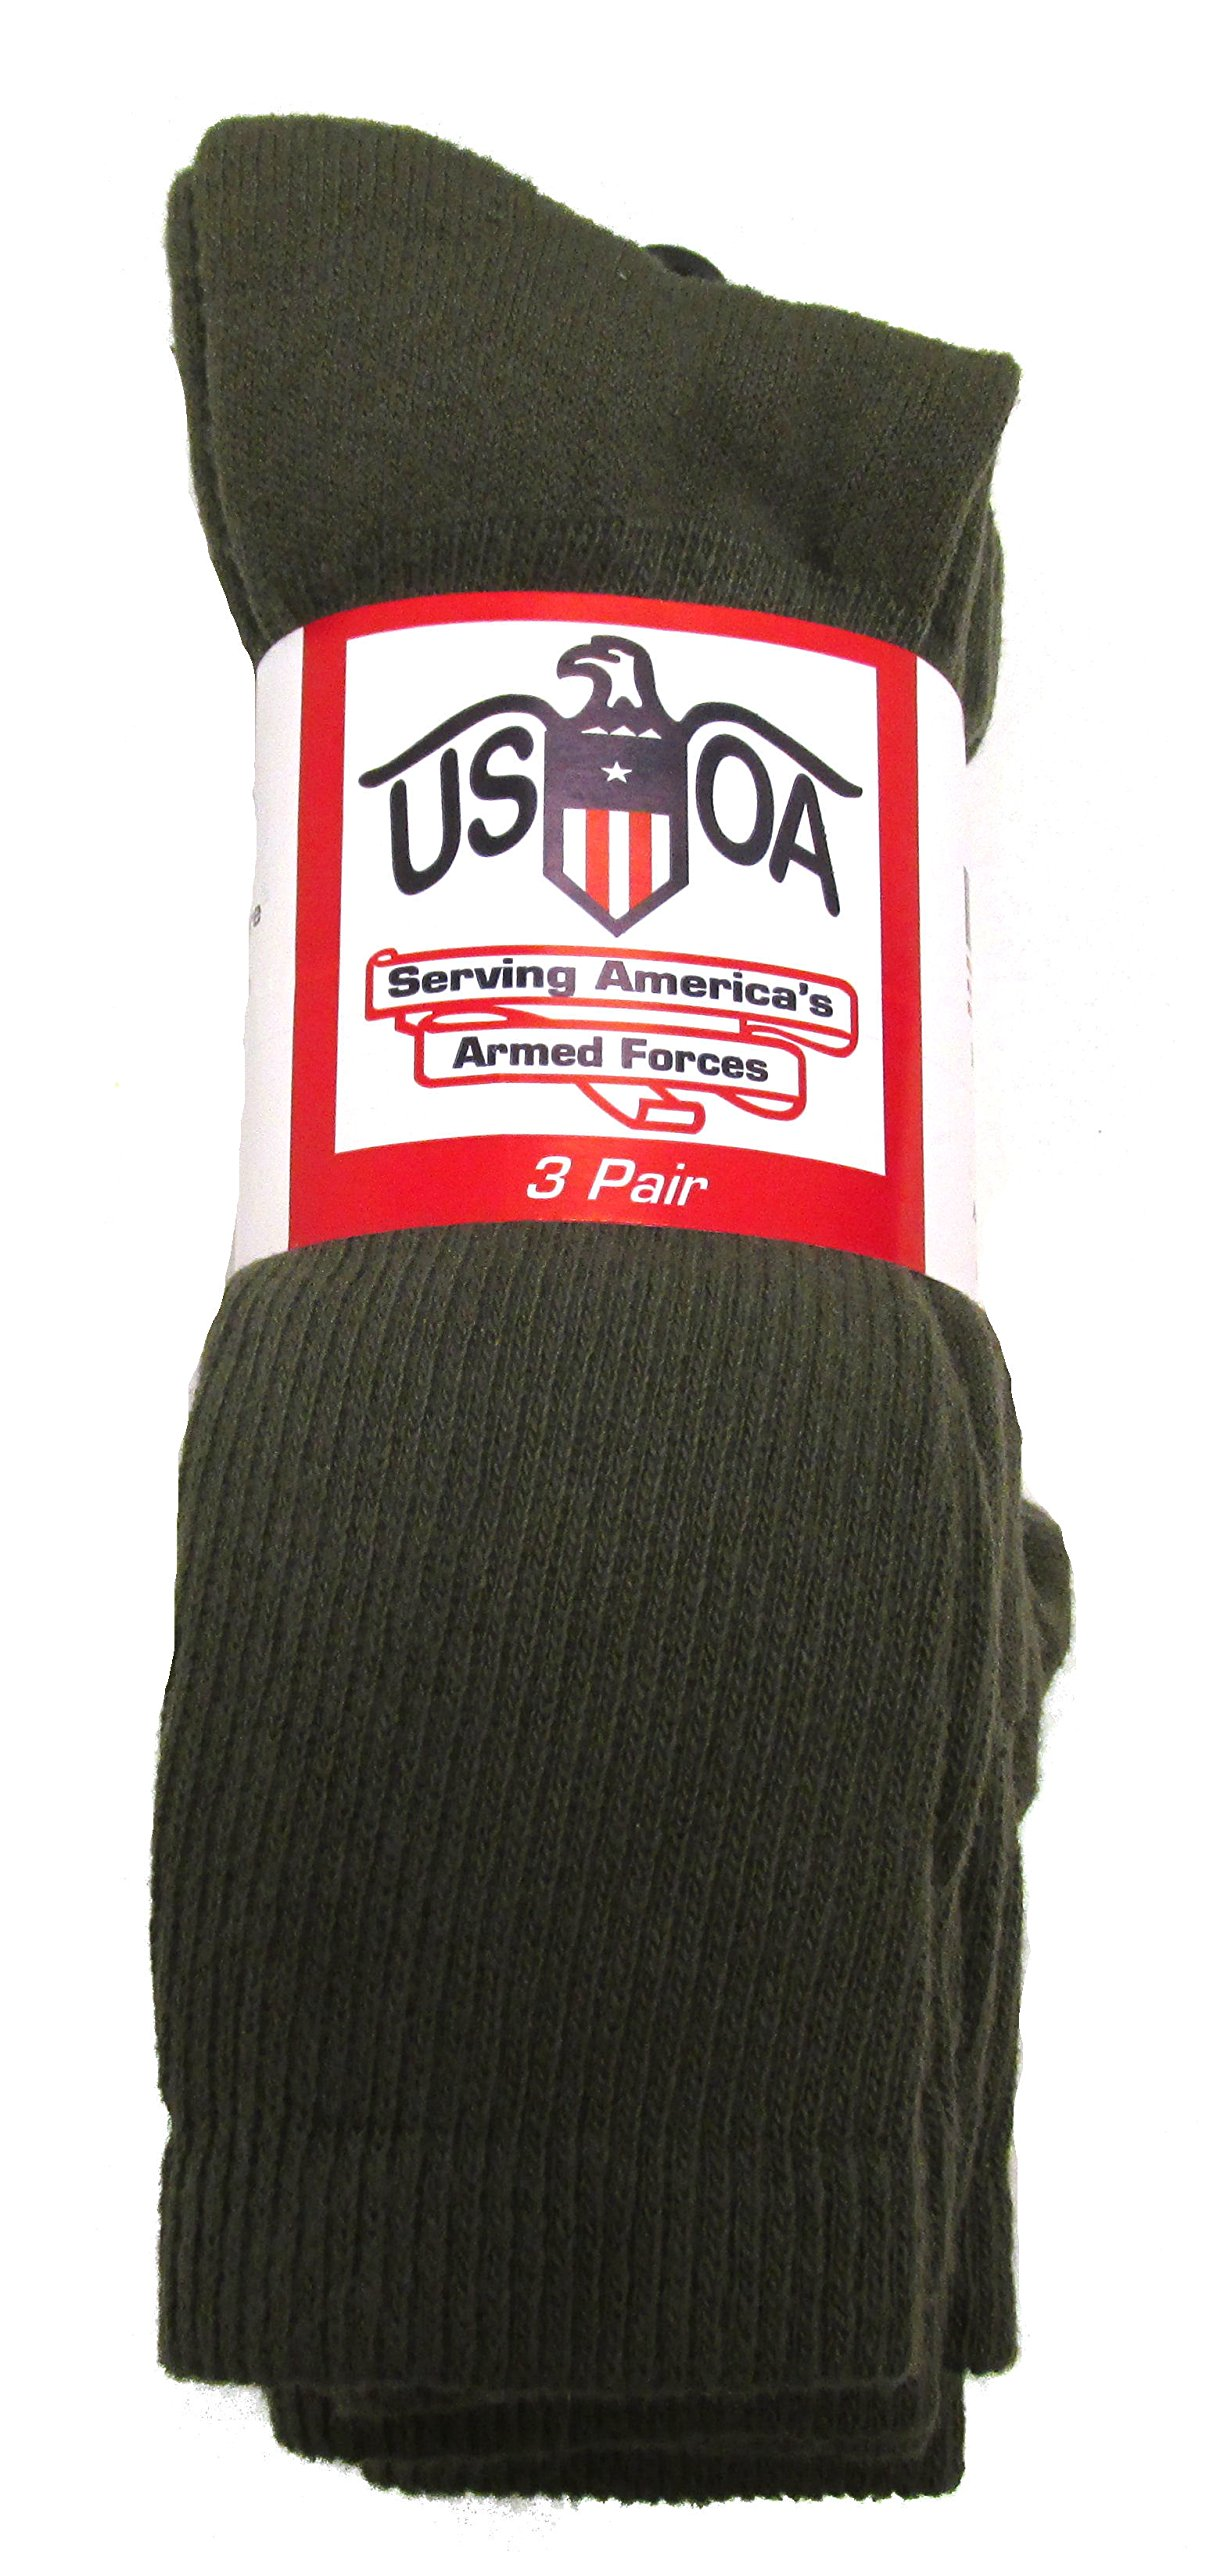 Men's Military Boot Socks OLIVE DRAB - 3 PAIR - LARGE